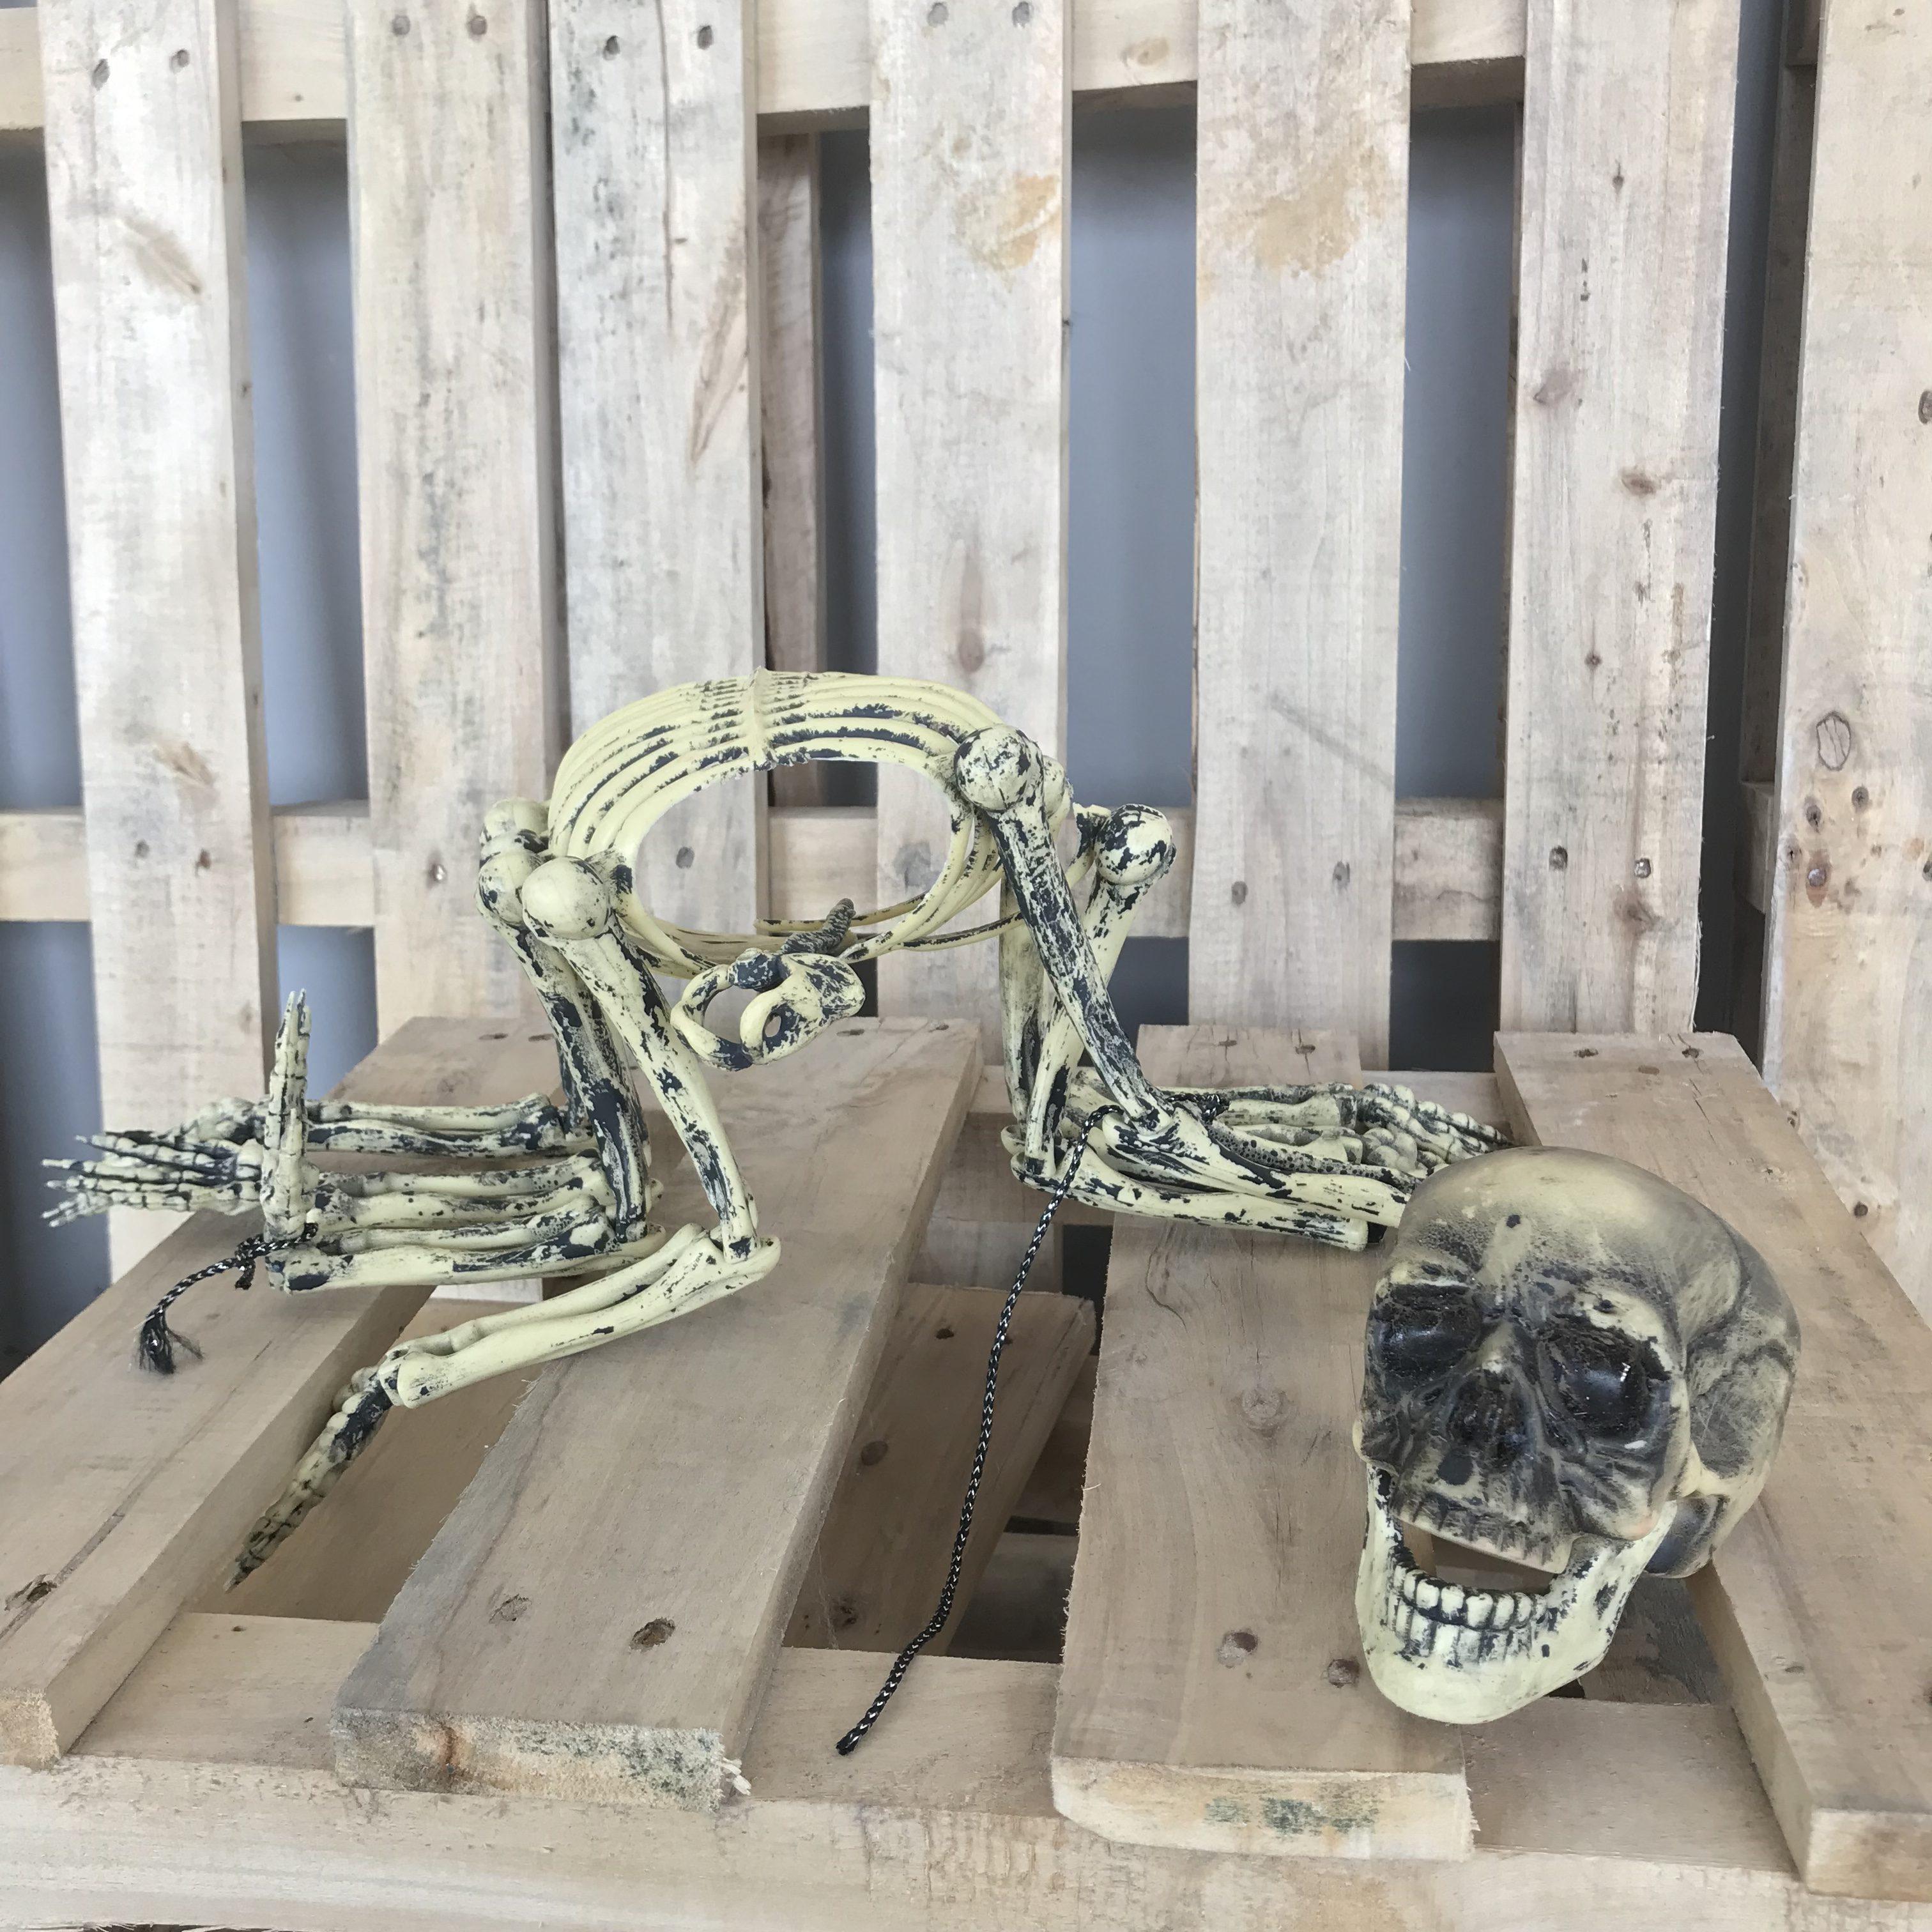 singapore-event-management-halloween-props-rental-8-legged-skeleton